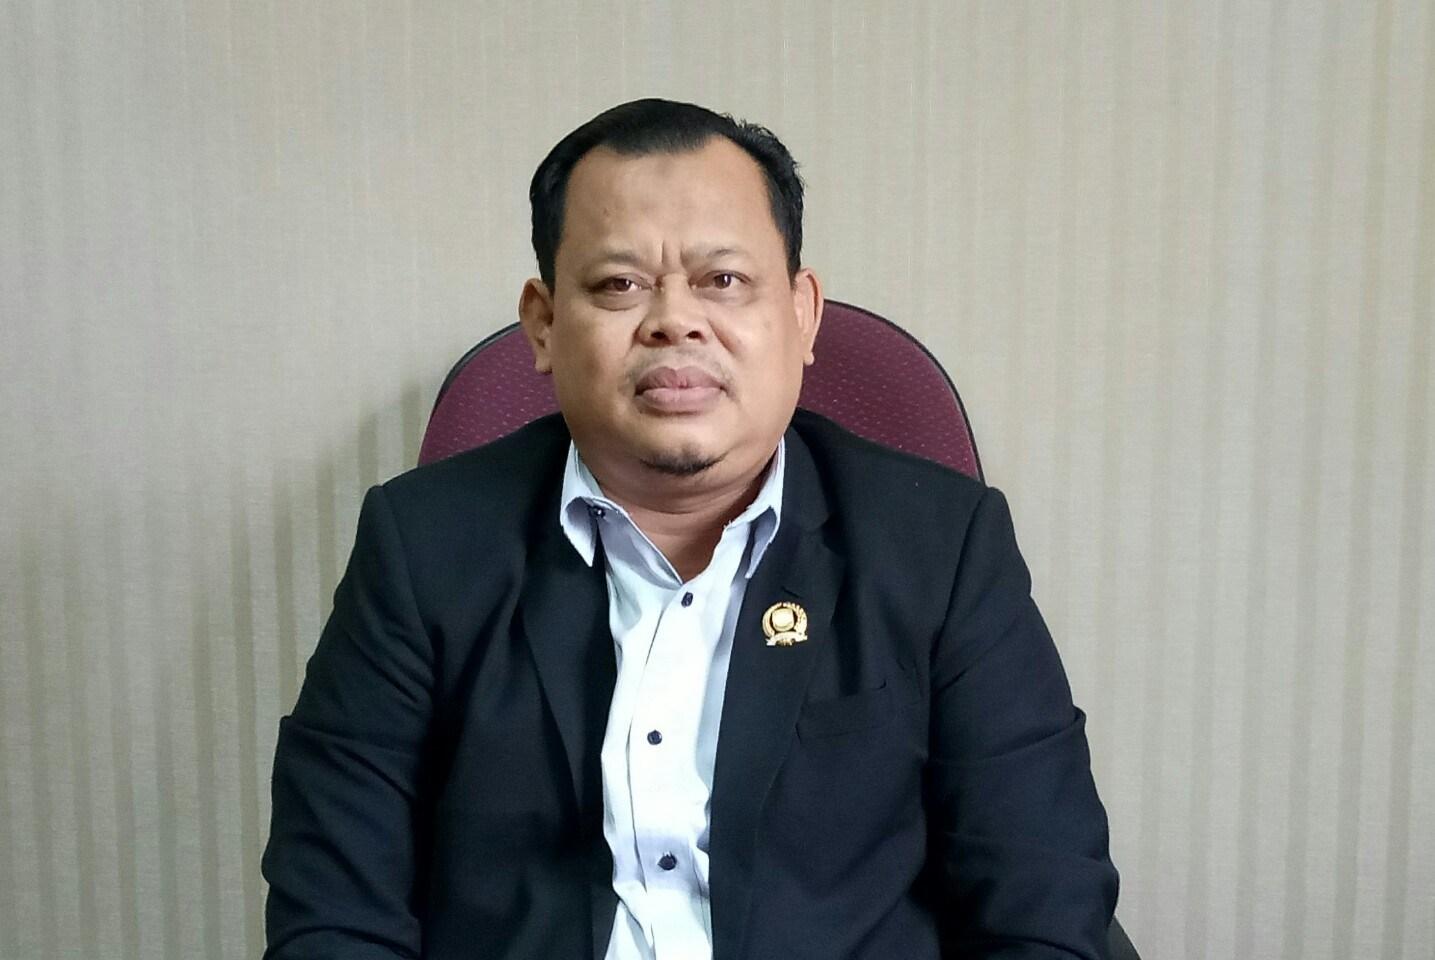 Golkar Dinilai Pegang Kunci Koalisi di Pilkada Kota Depok, Berikut Analisanya